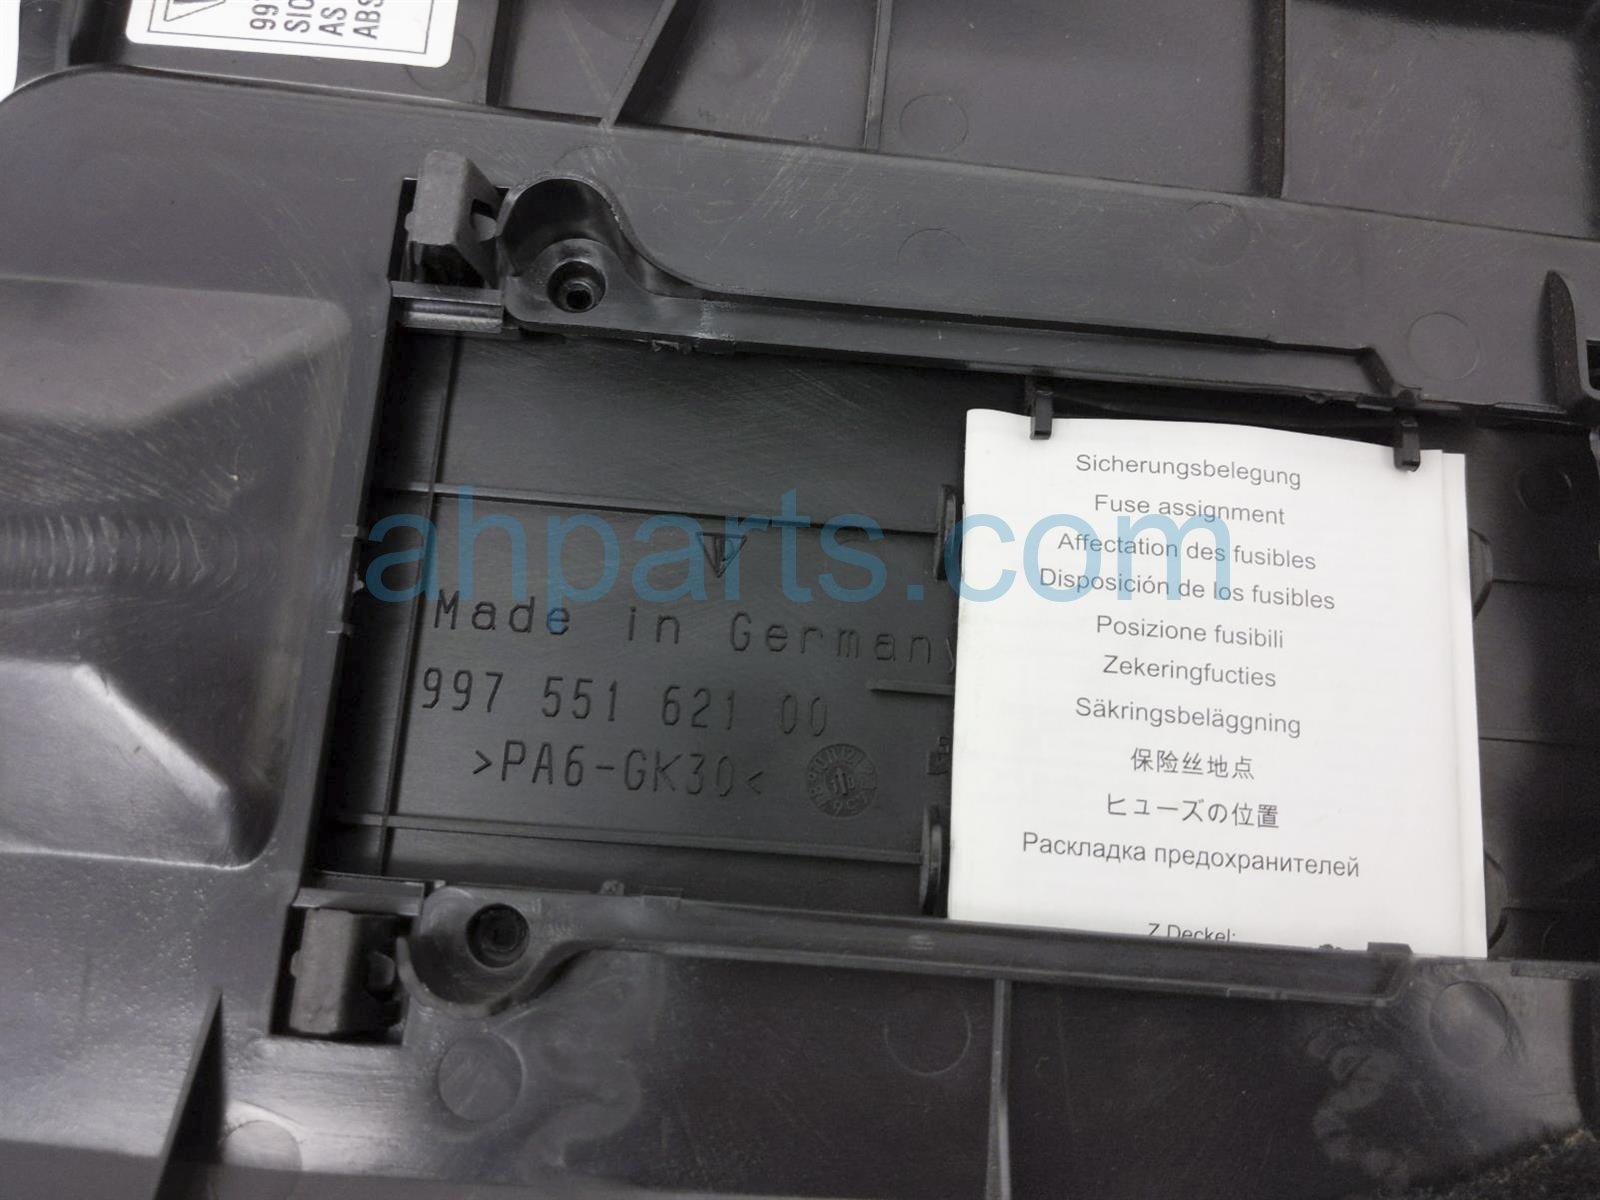 2011 Porsche Cayman Front Door Trim / Liner Driver Kick Panel Cover   Black 997 551 101 00 A10 Replacement